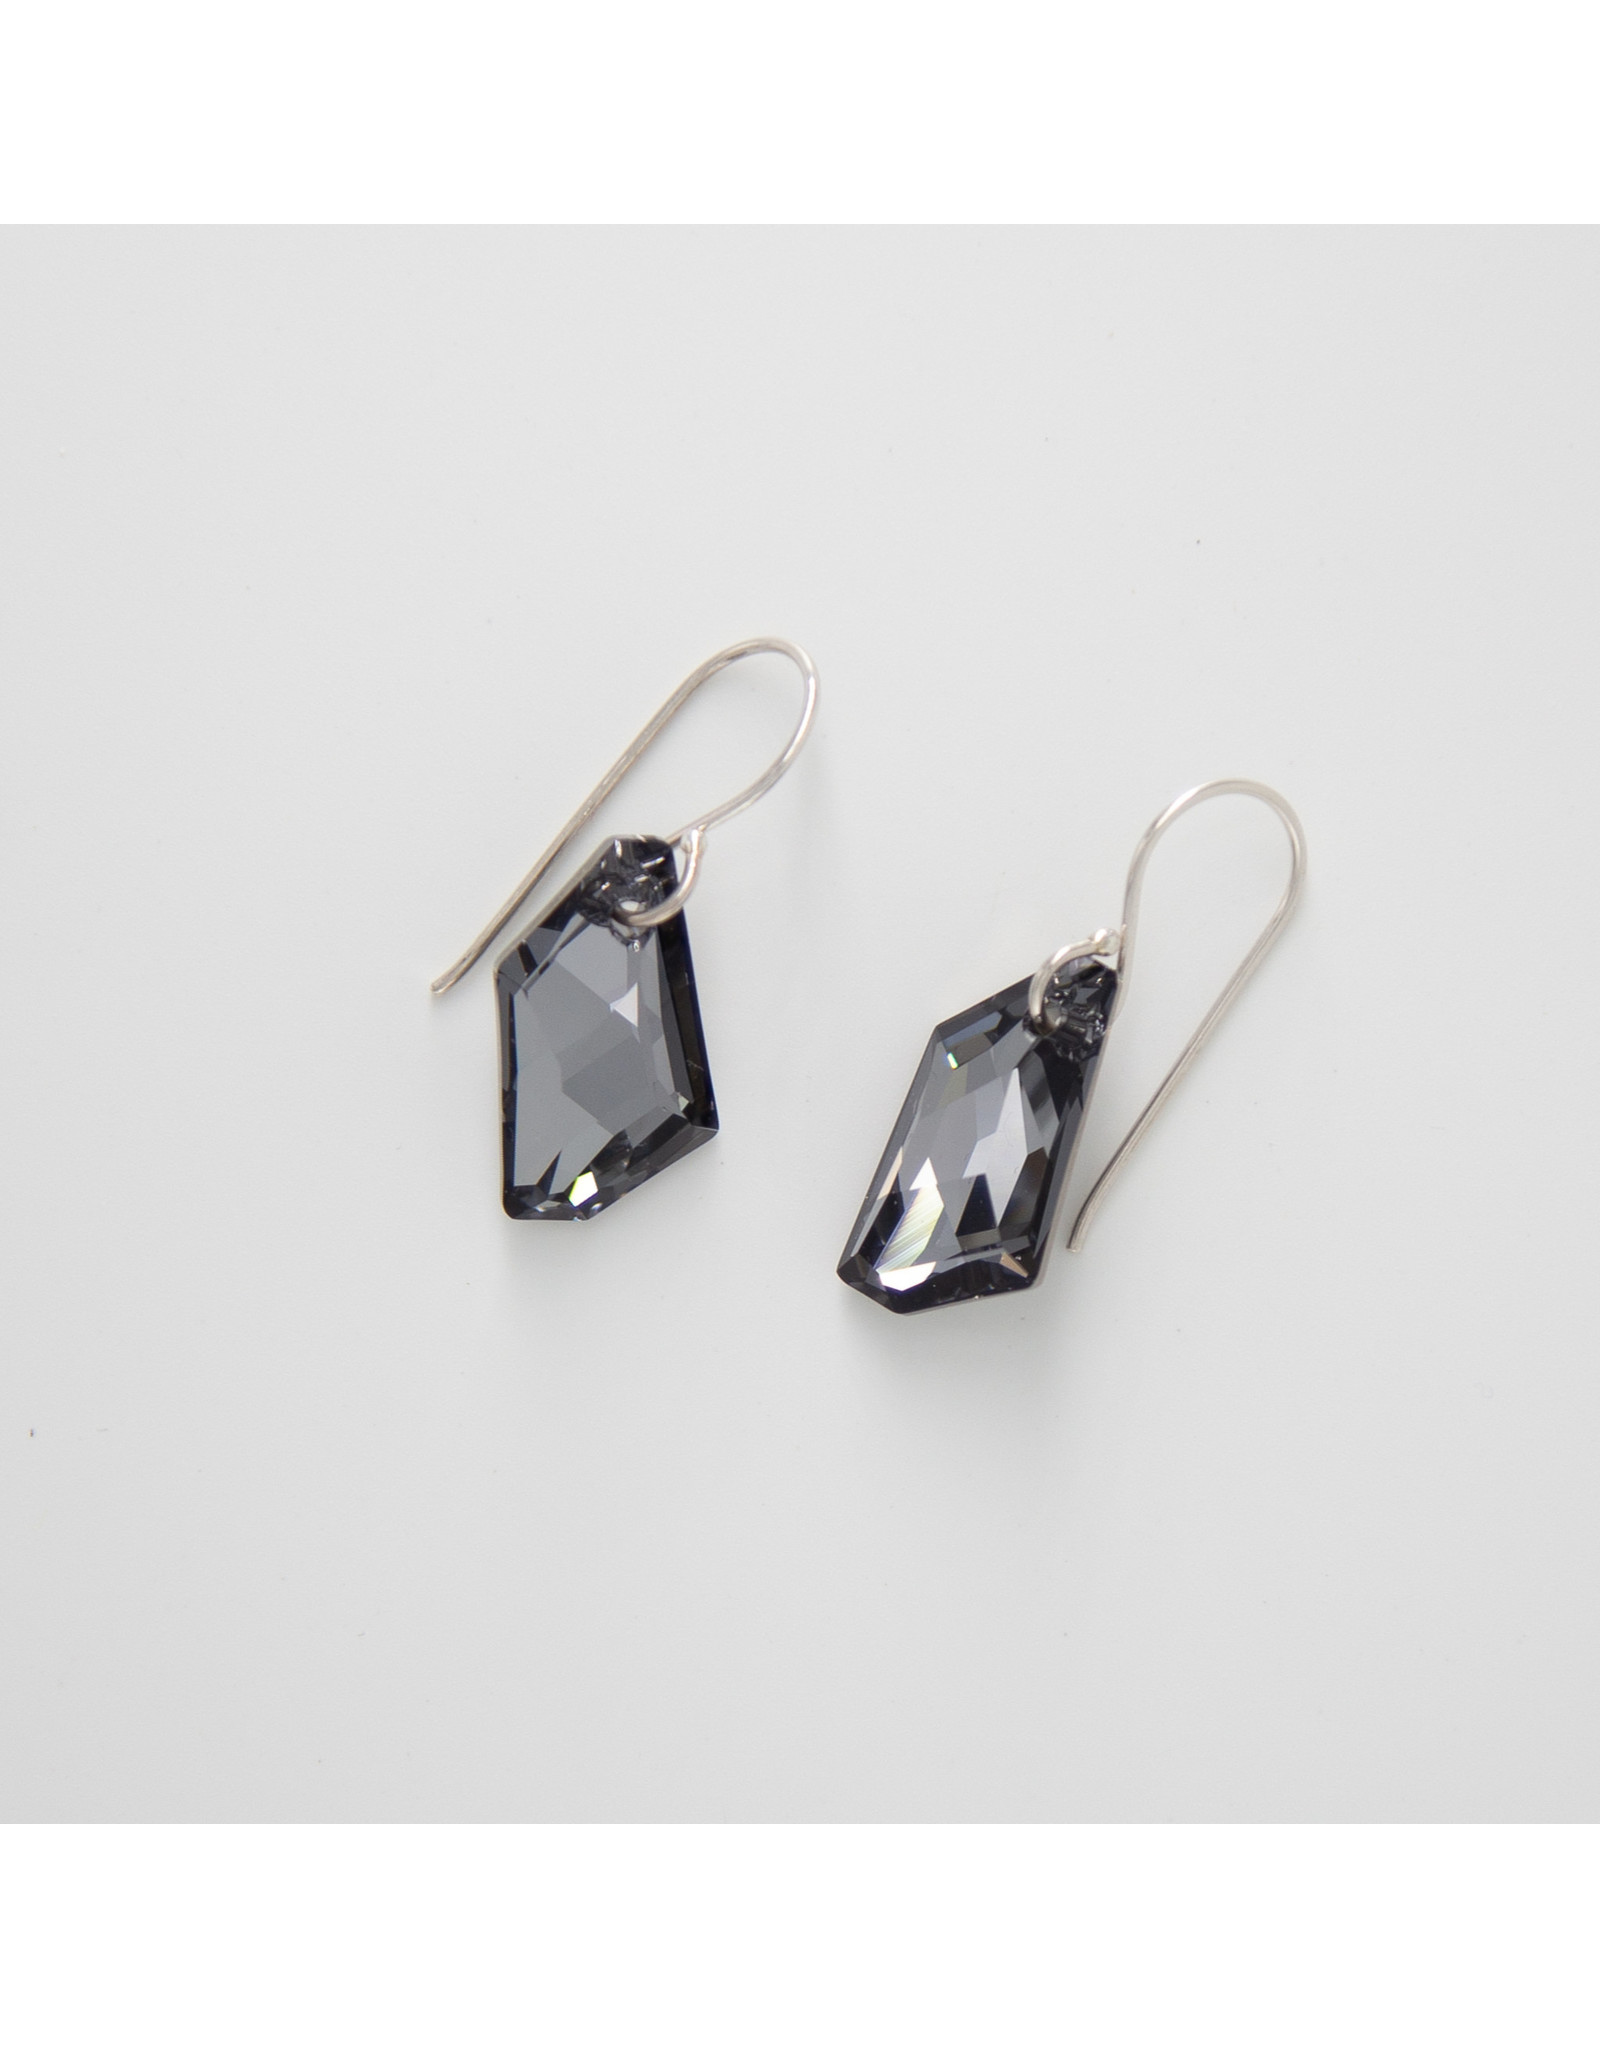 Diablo Organics Diablo Organics Black Diamond De-Art Swarovski crystal traditional earrings on silver coils